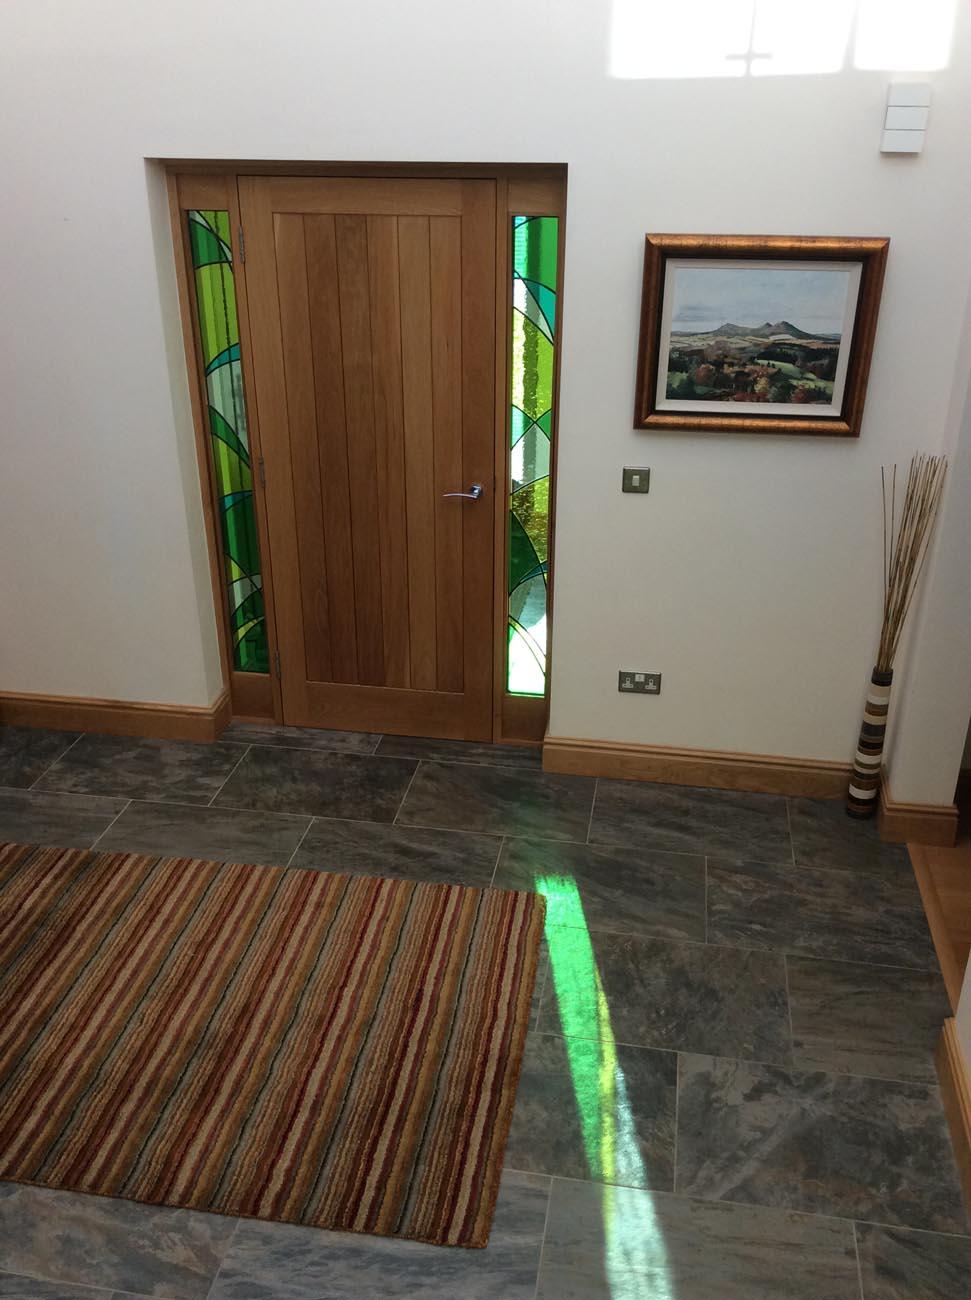 Greendoorstainedglass